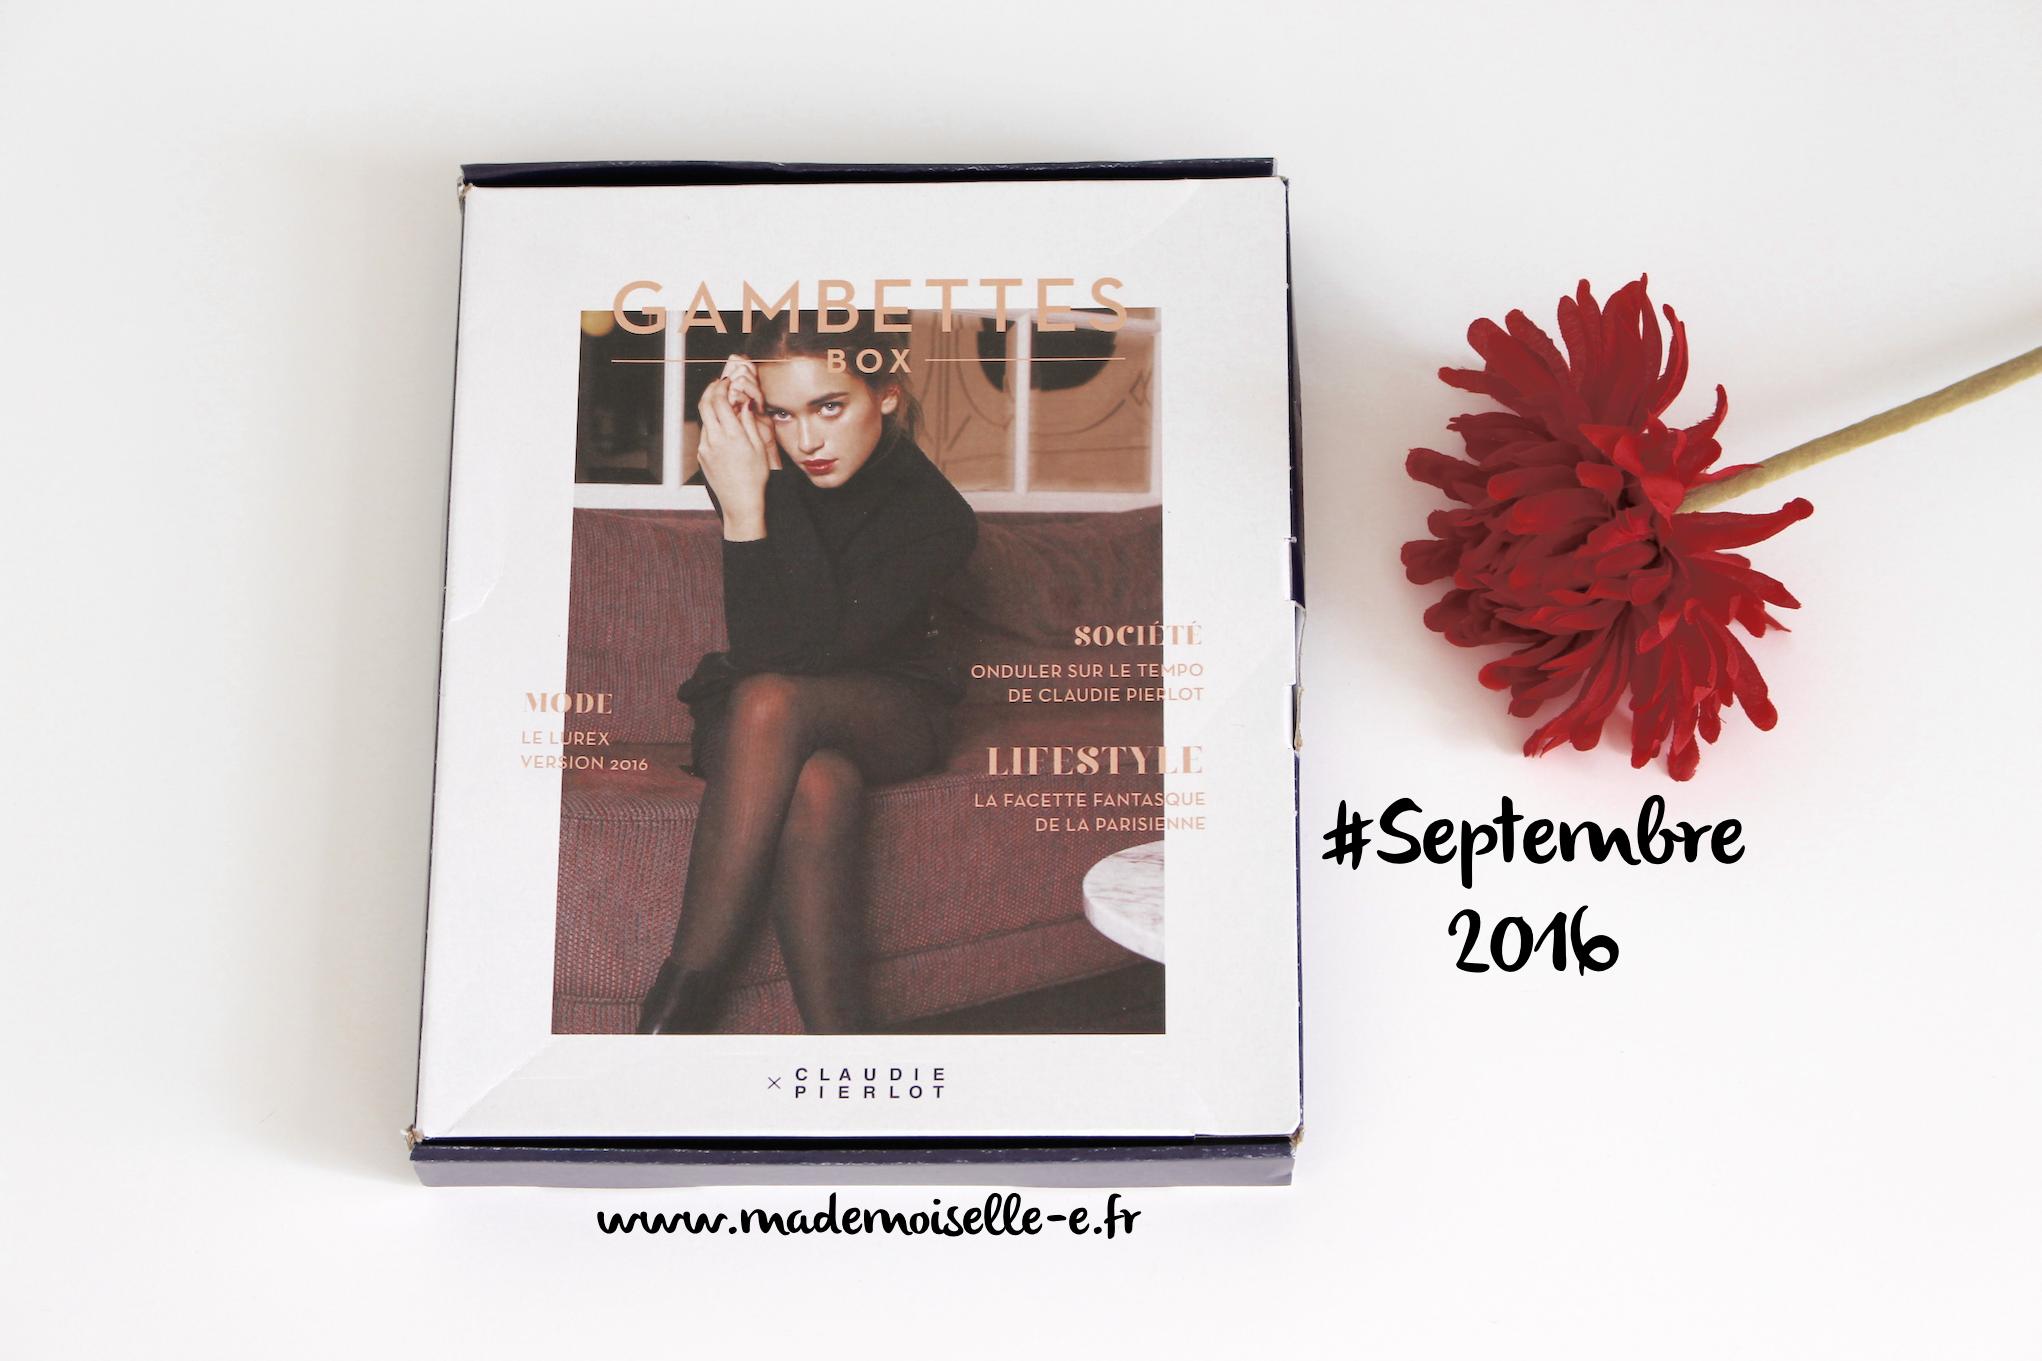 Gambettes box #Septembre 2016 Mademoiselle E – presentation